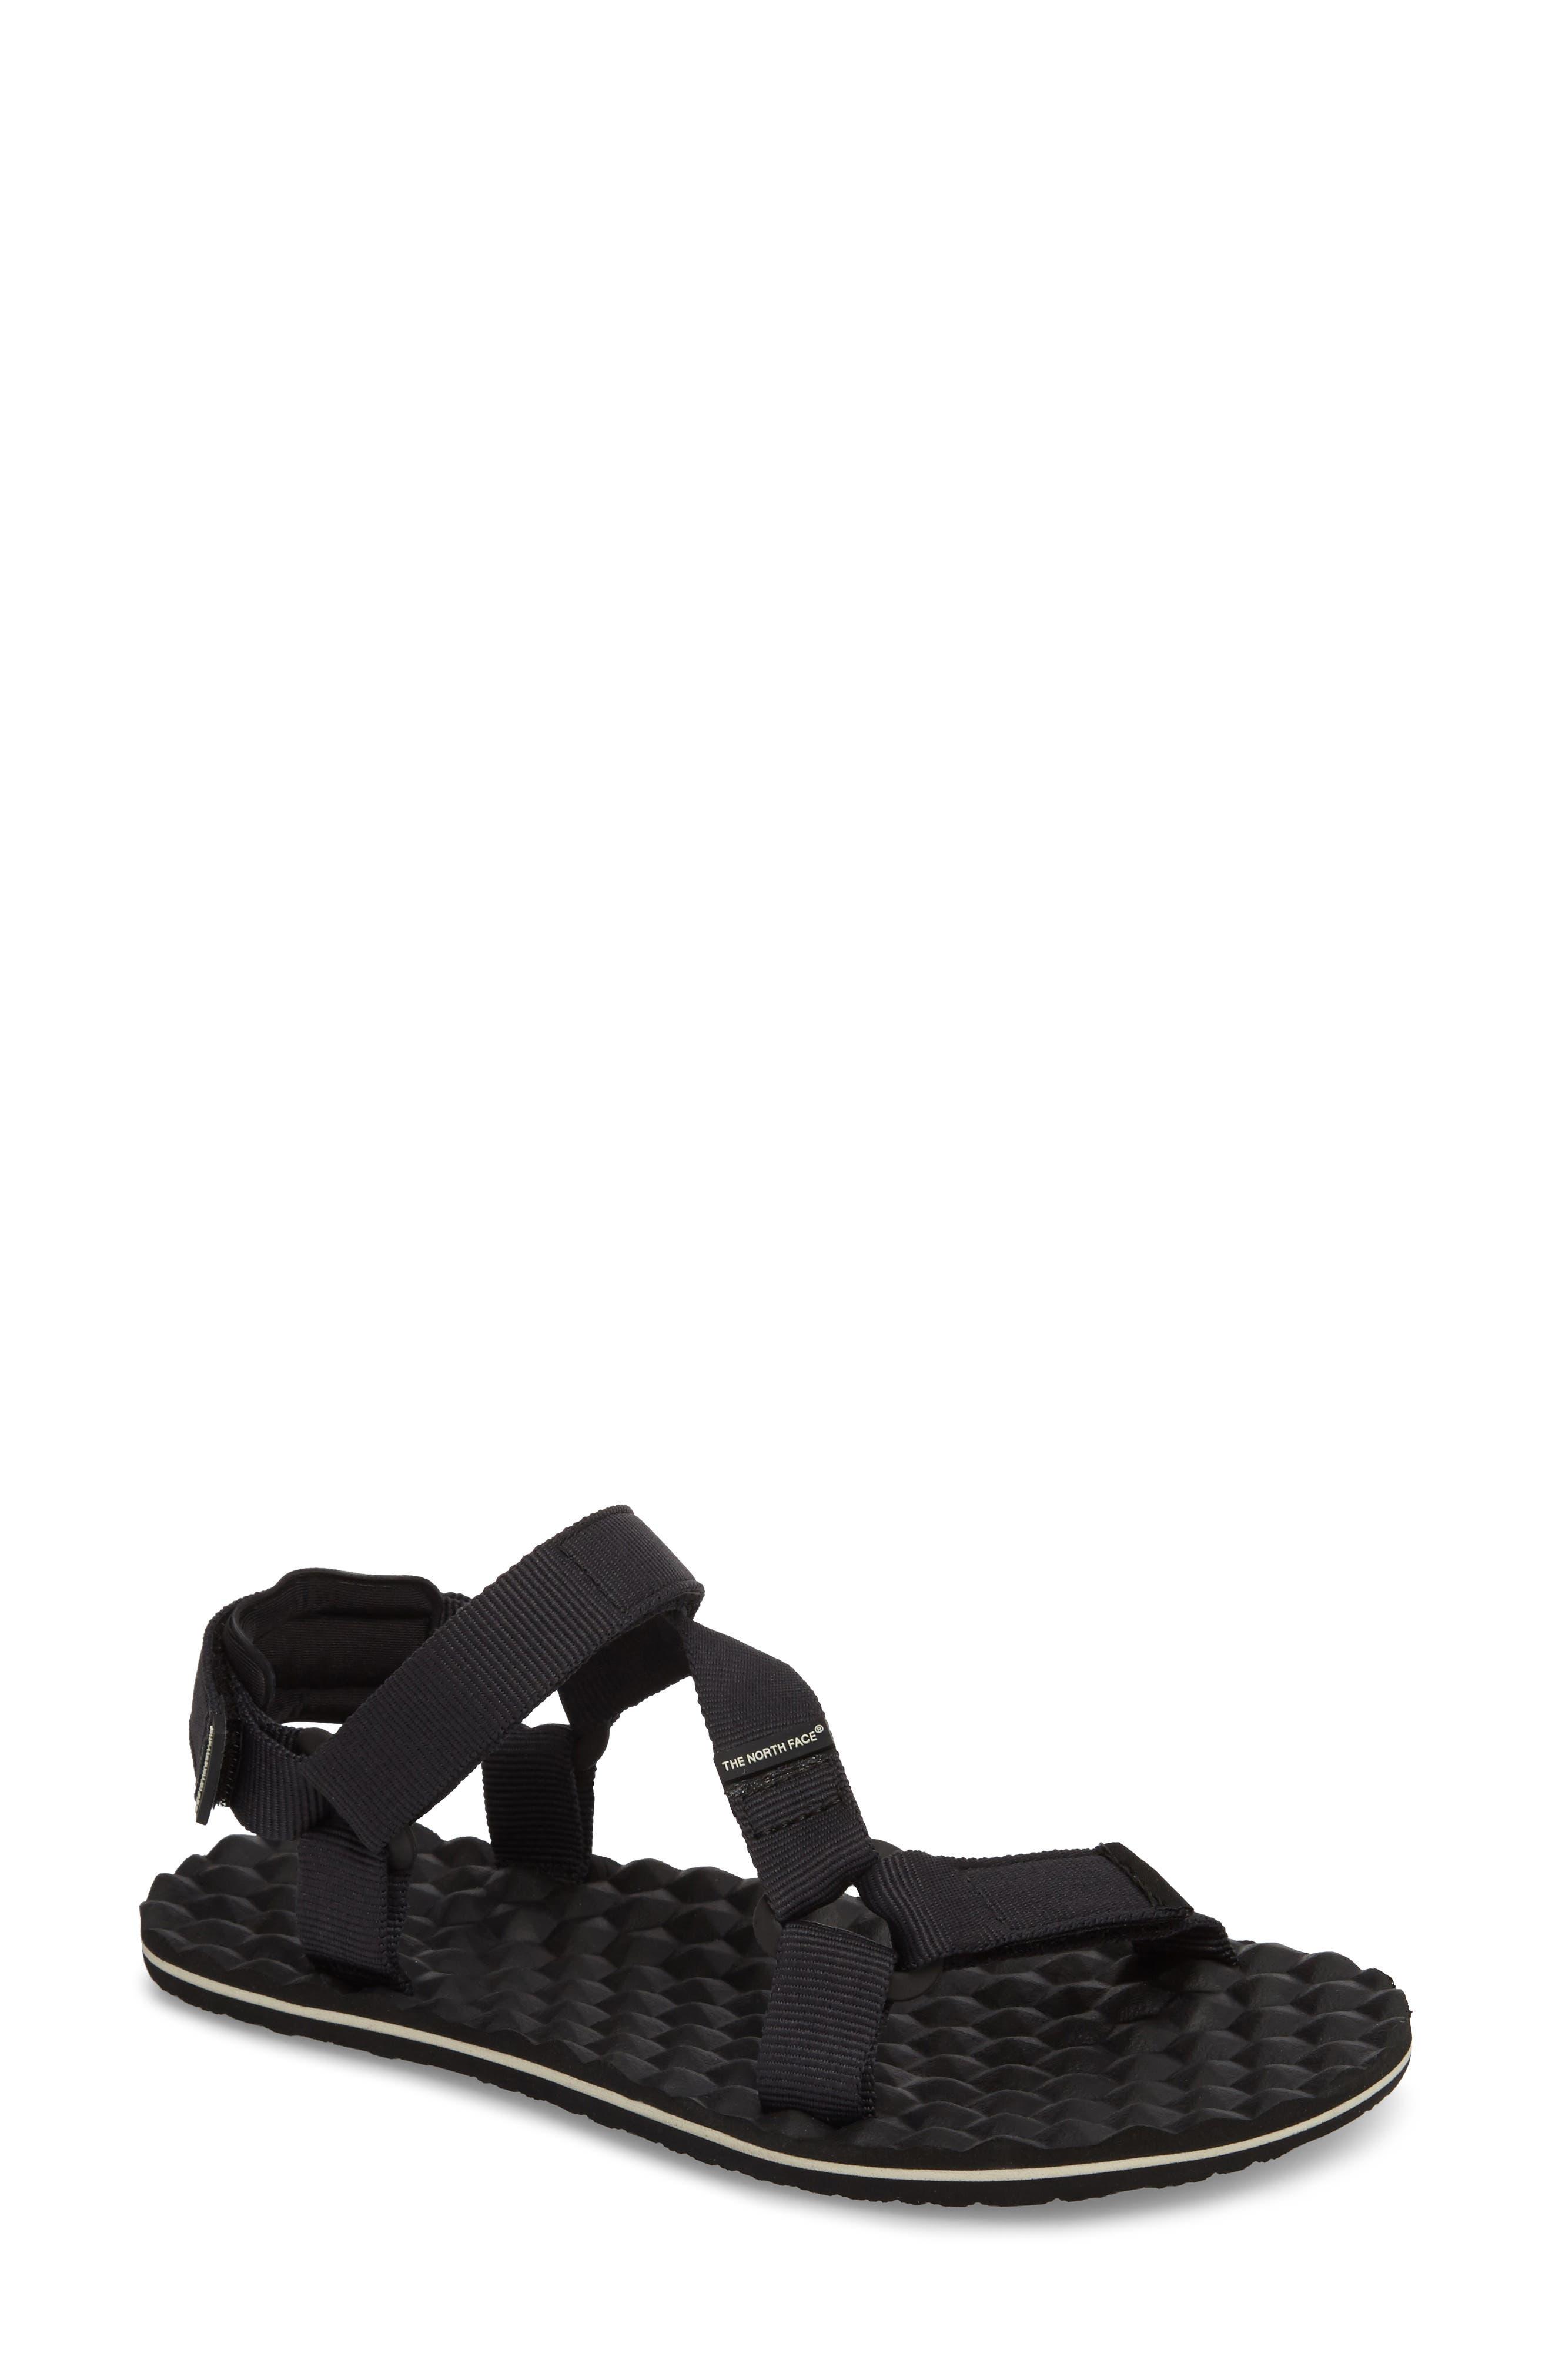 19b63414d Base Camp Switchback Sandal, Tnf Black/ Vintage White